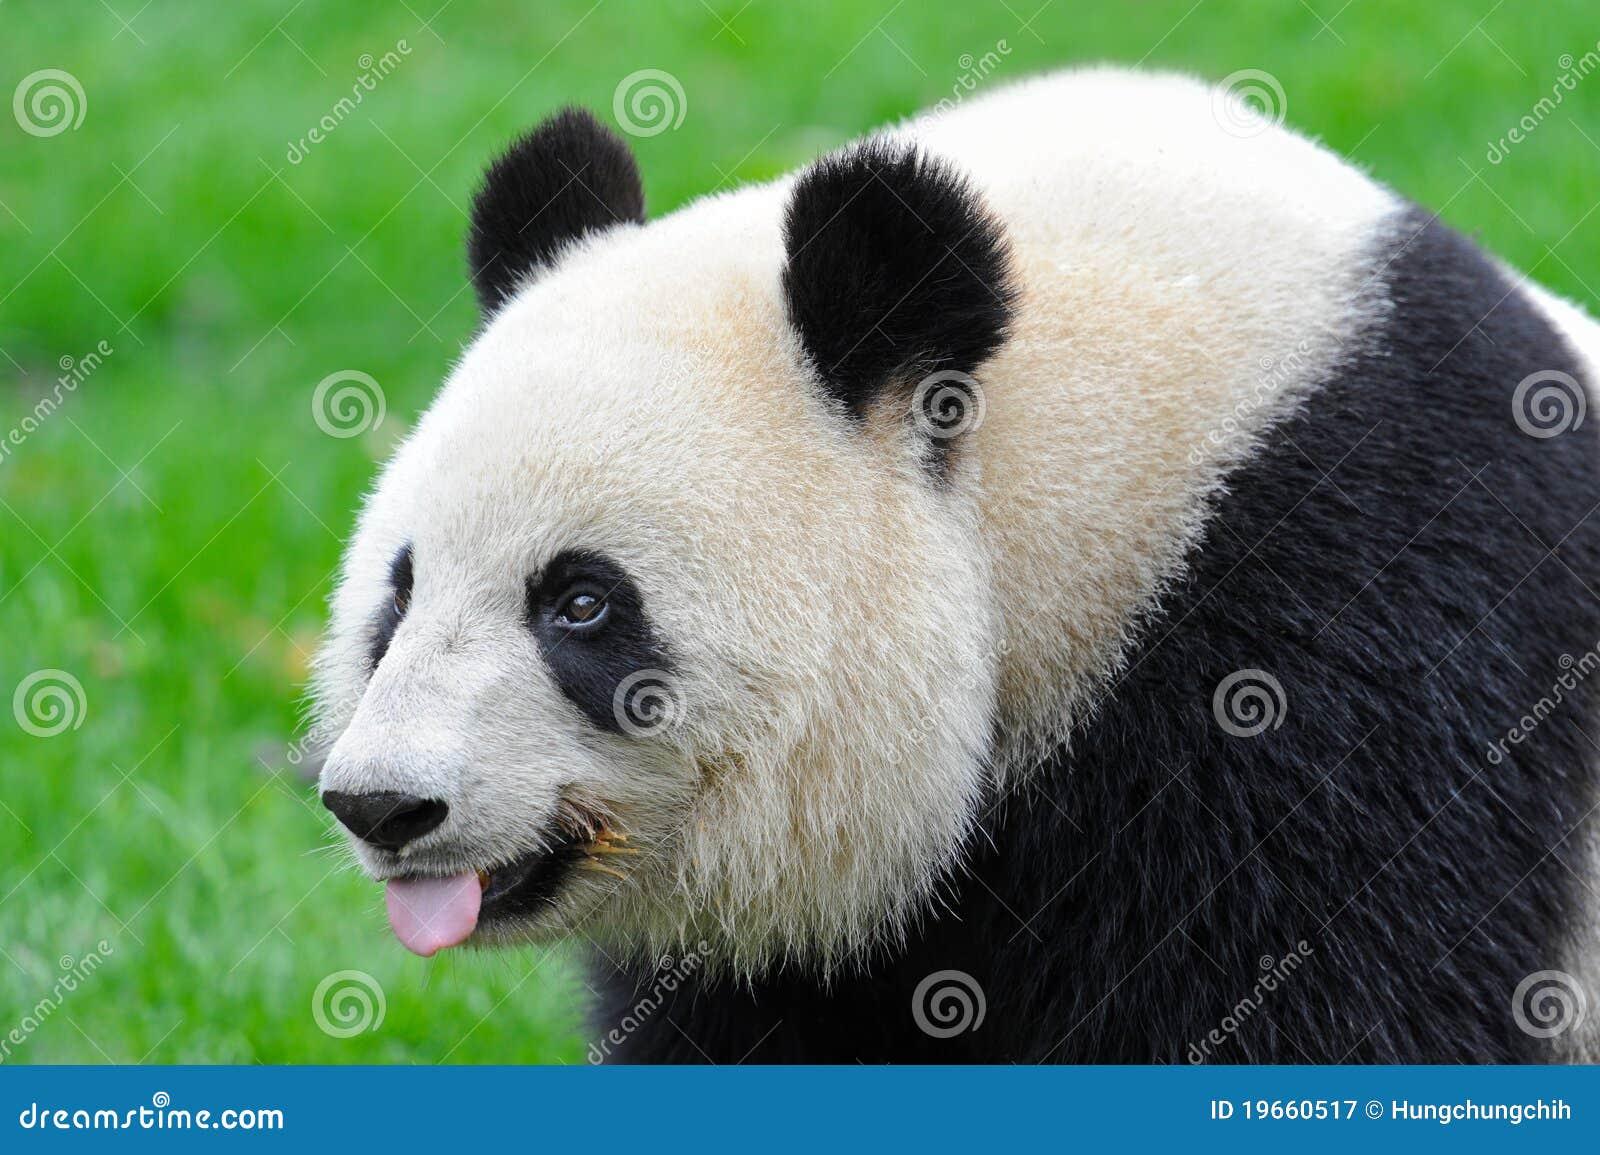 essay on panda bears